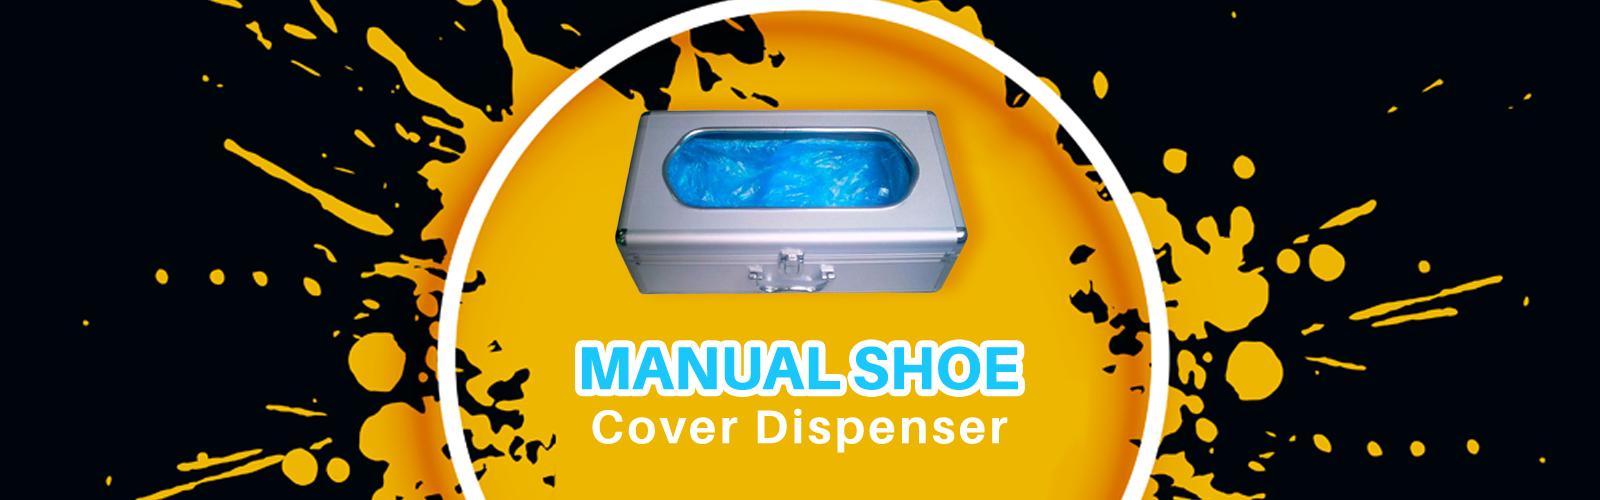 Manual Shoe Cover <span> Dispenser